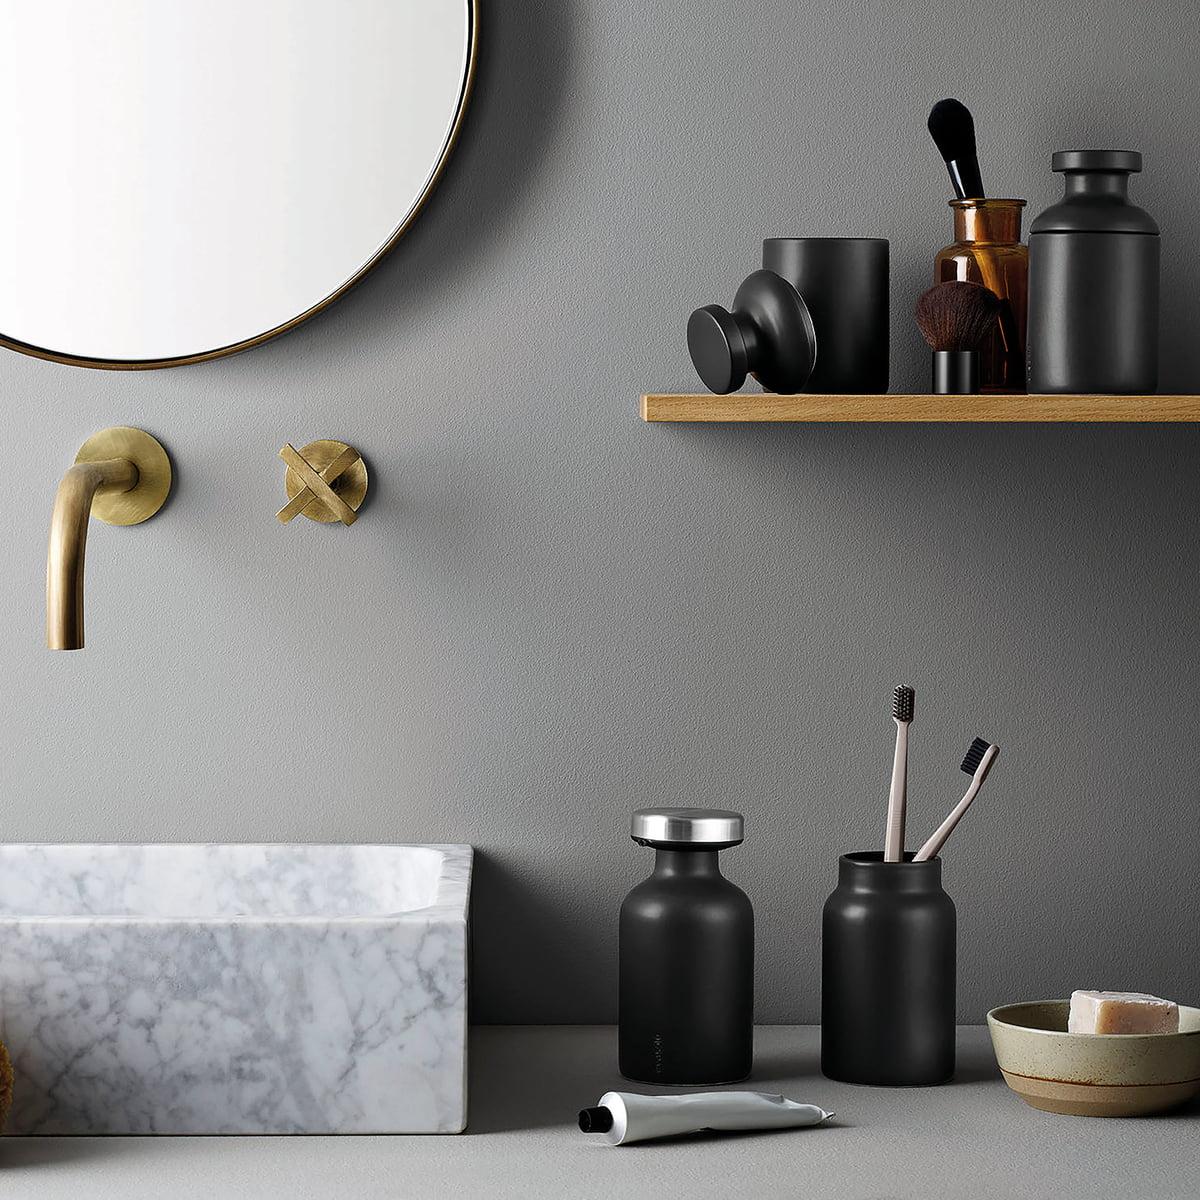 Eva Solo - Bathroom Accessories